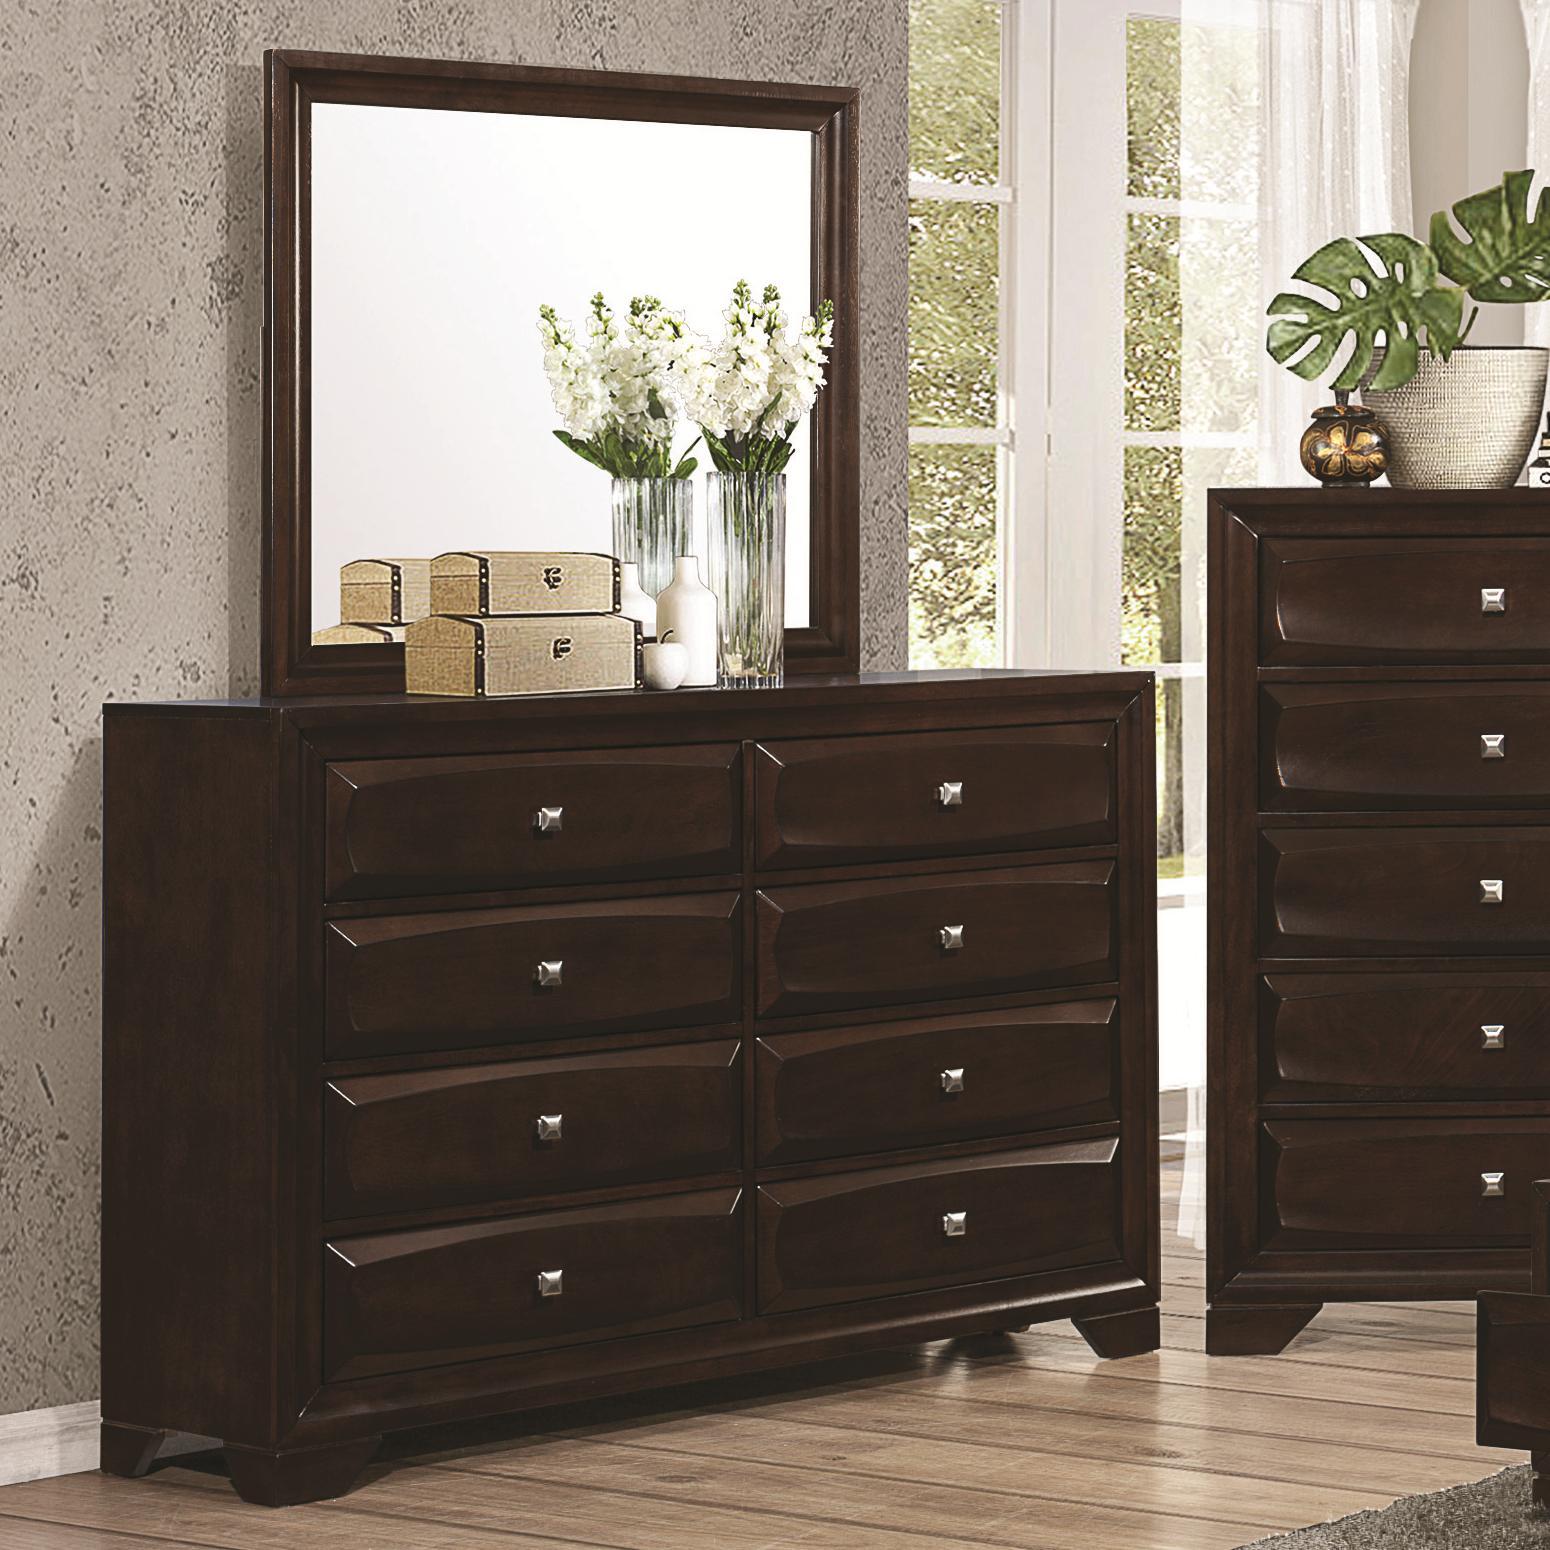 Coaster Jaxson Dresser and Mirror Combo - Item Number: 203483+203484